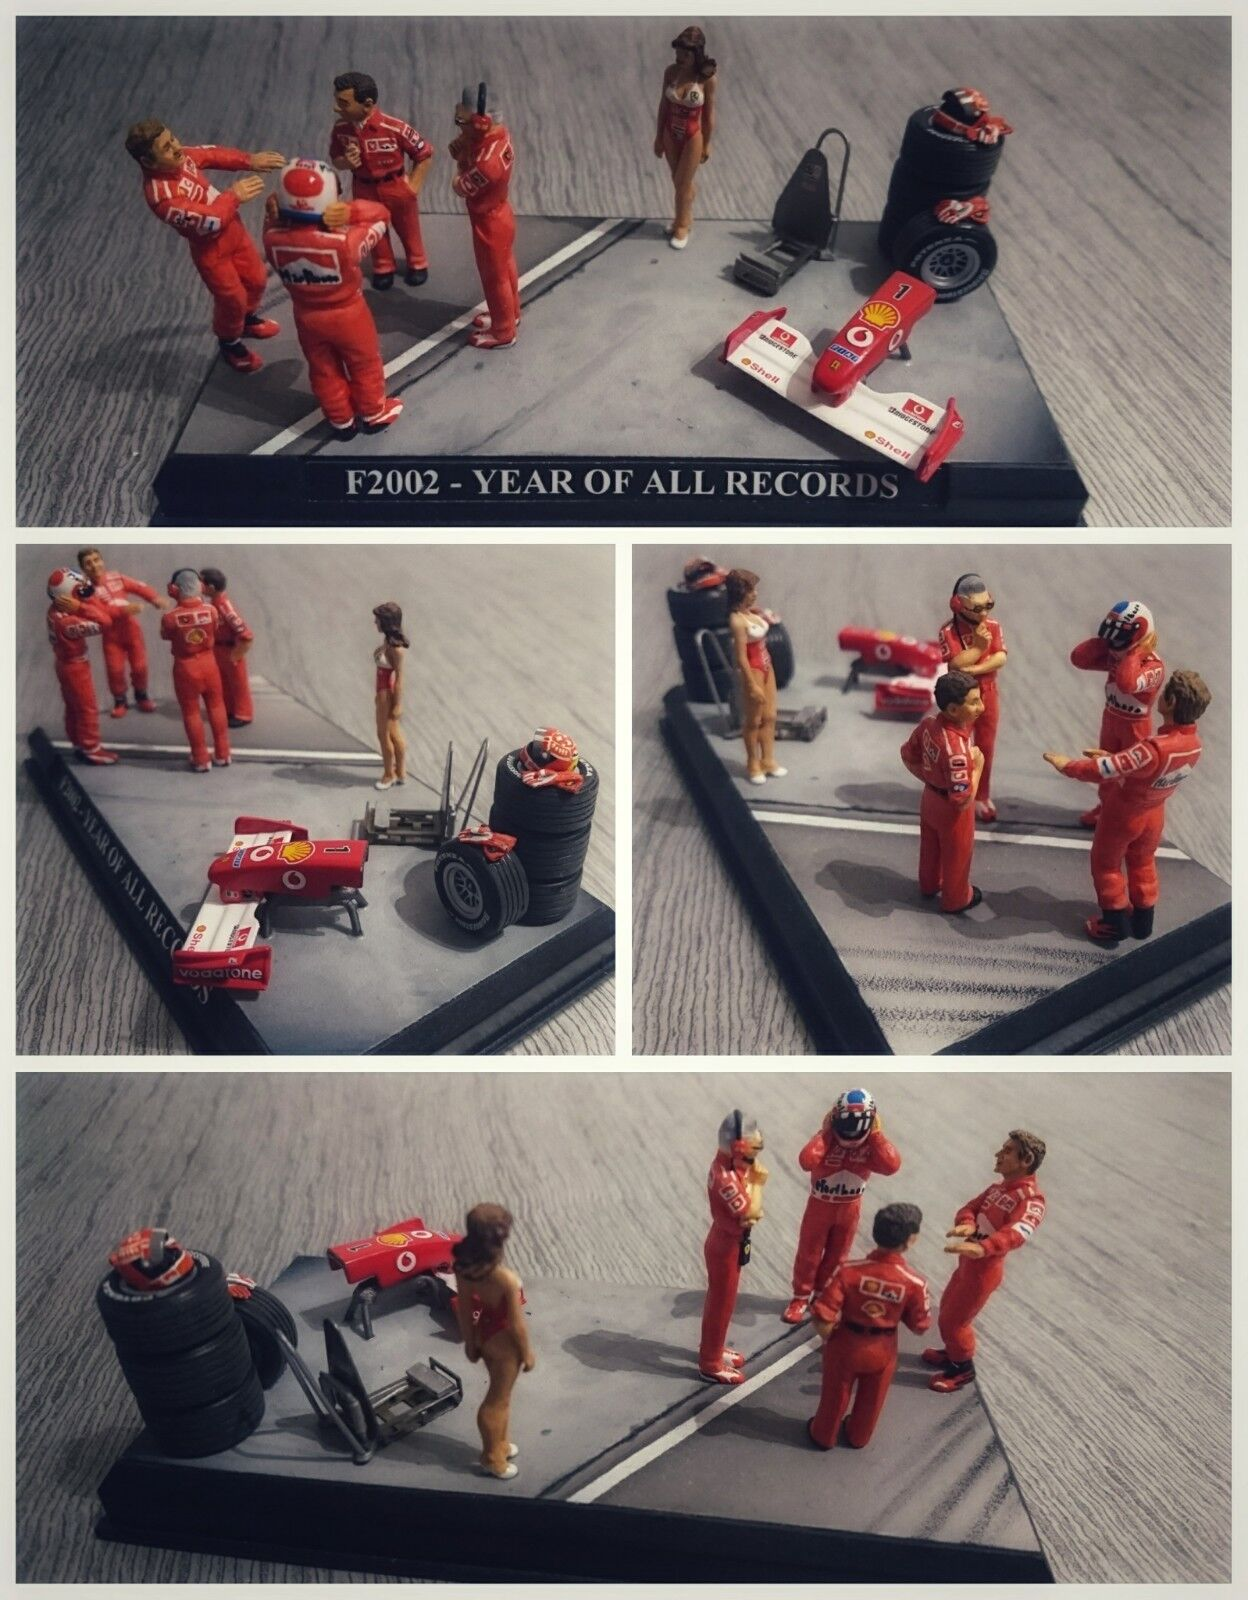 Schumacher barrichello brawn todt diorama ferrari 2002 1 43 f1 single figurine